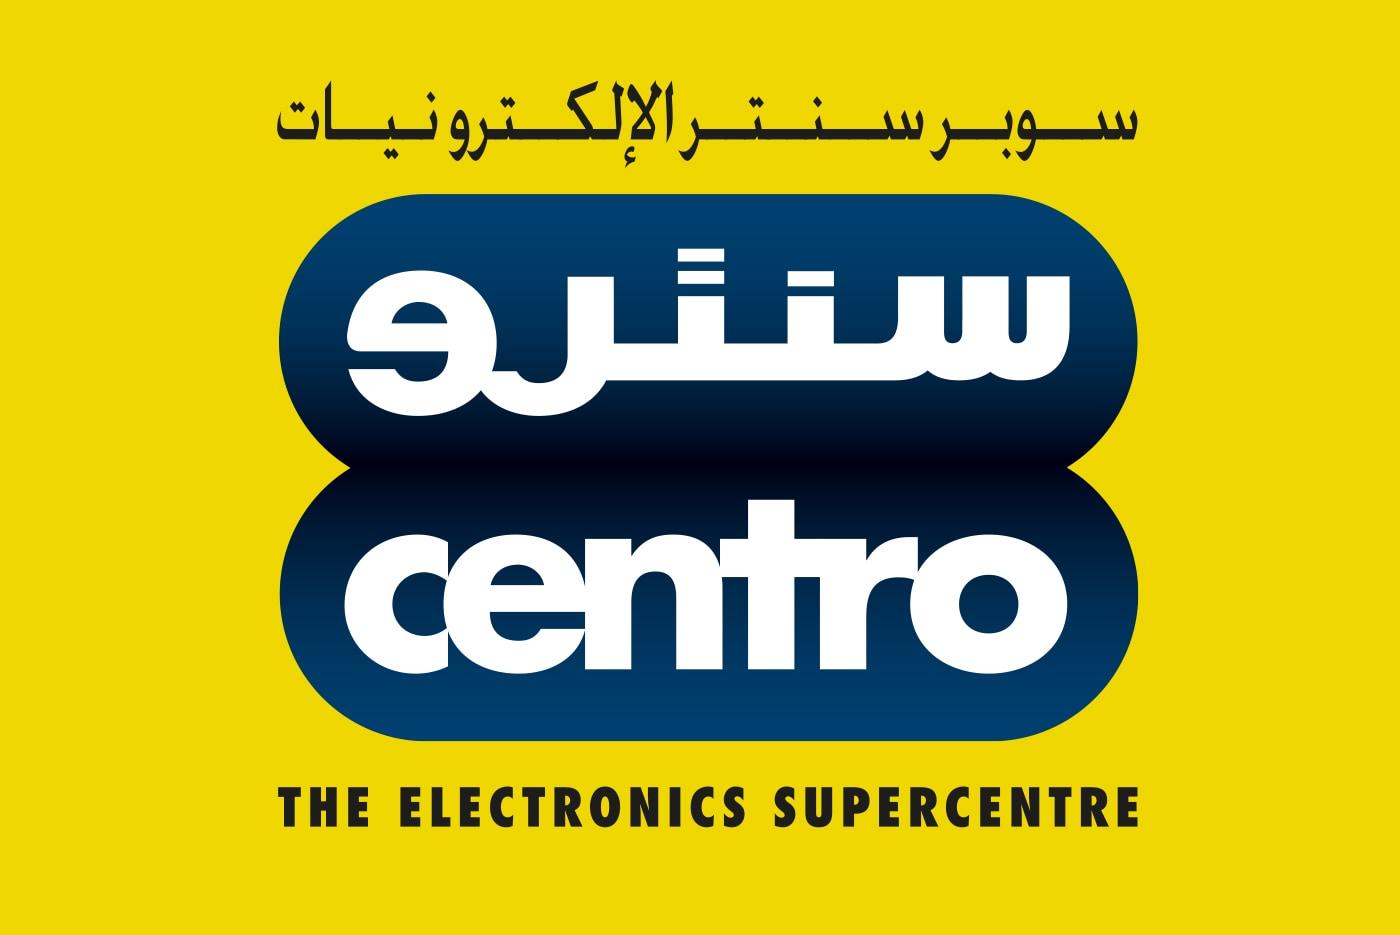 Centro Electronics Supercentre